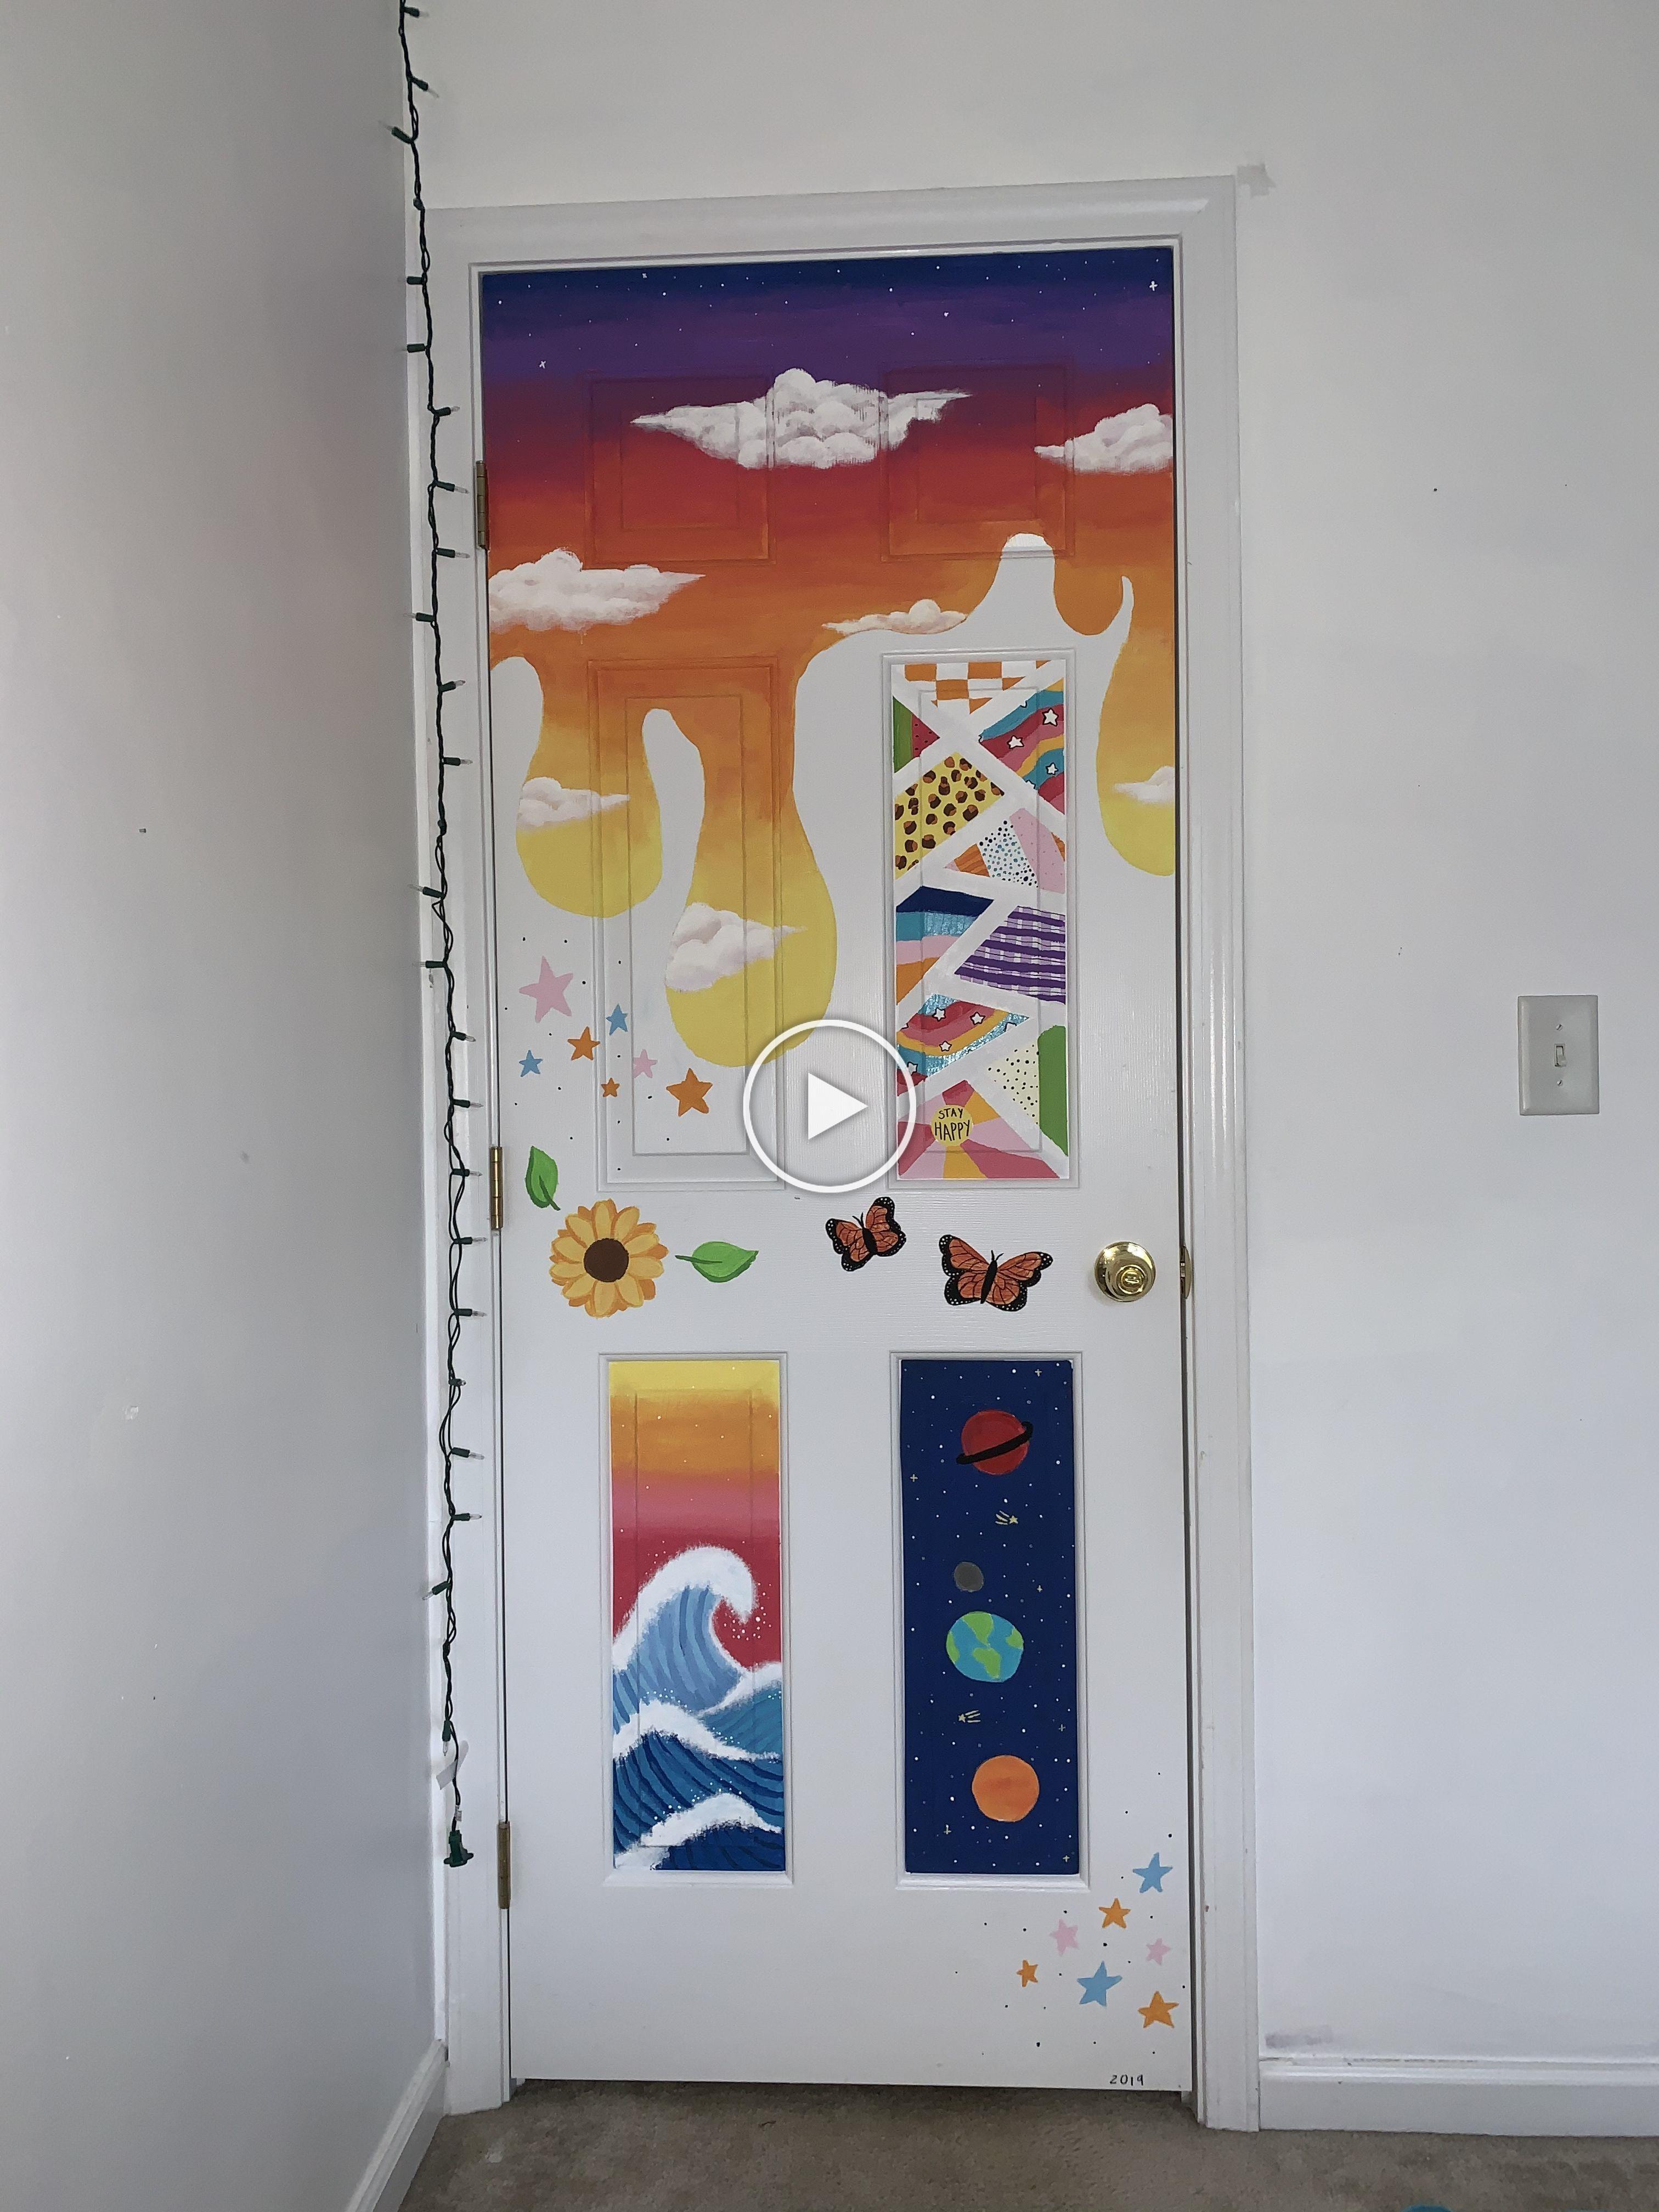 Painting Vsco Doorpainting Door Cute Tiktok Tiktokpaint Art Create Painted Bedroom Doors Painted Doors Bedroom Wall Paint